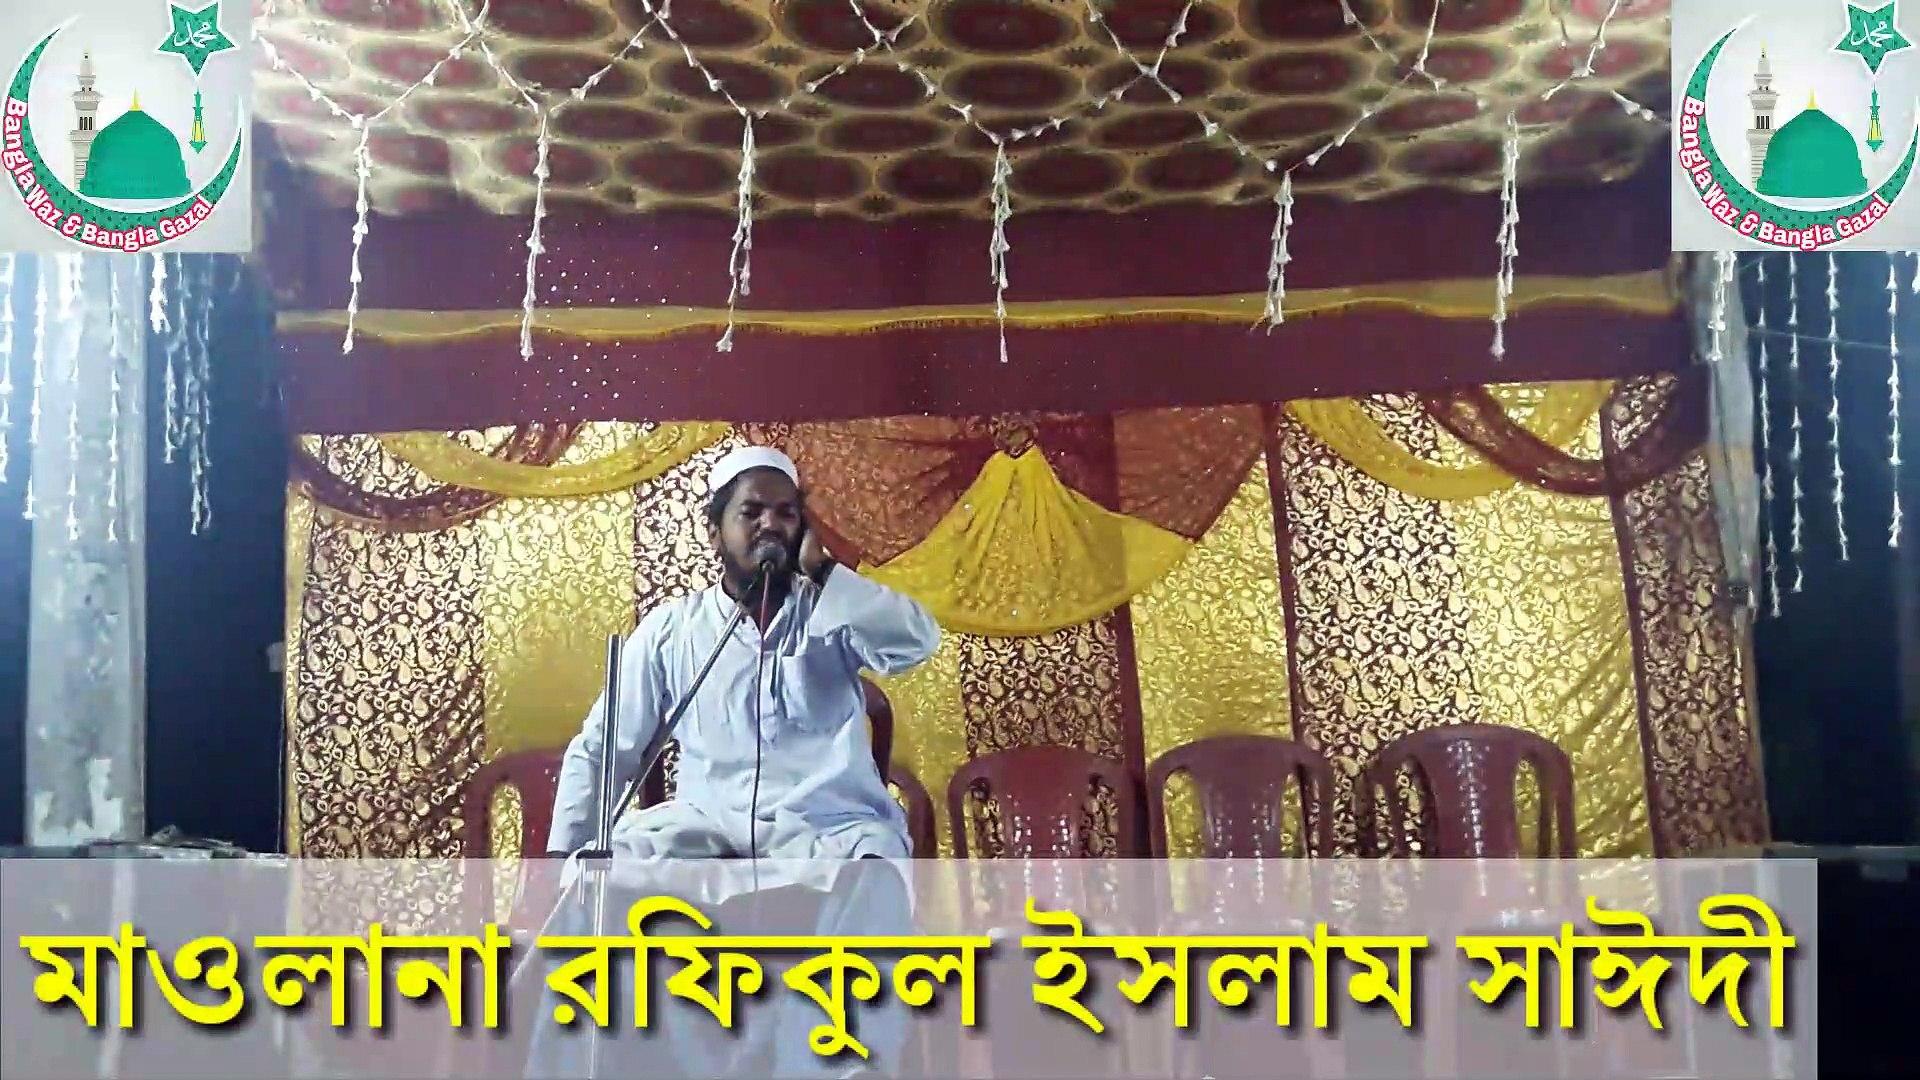 New Bangla Waz Rafiqul Islam | নুতন বাংলা ওয়াজ রফিকুল ইসলাম